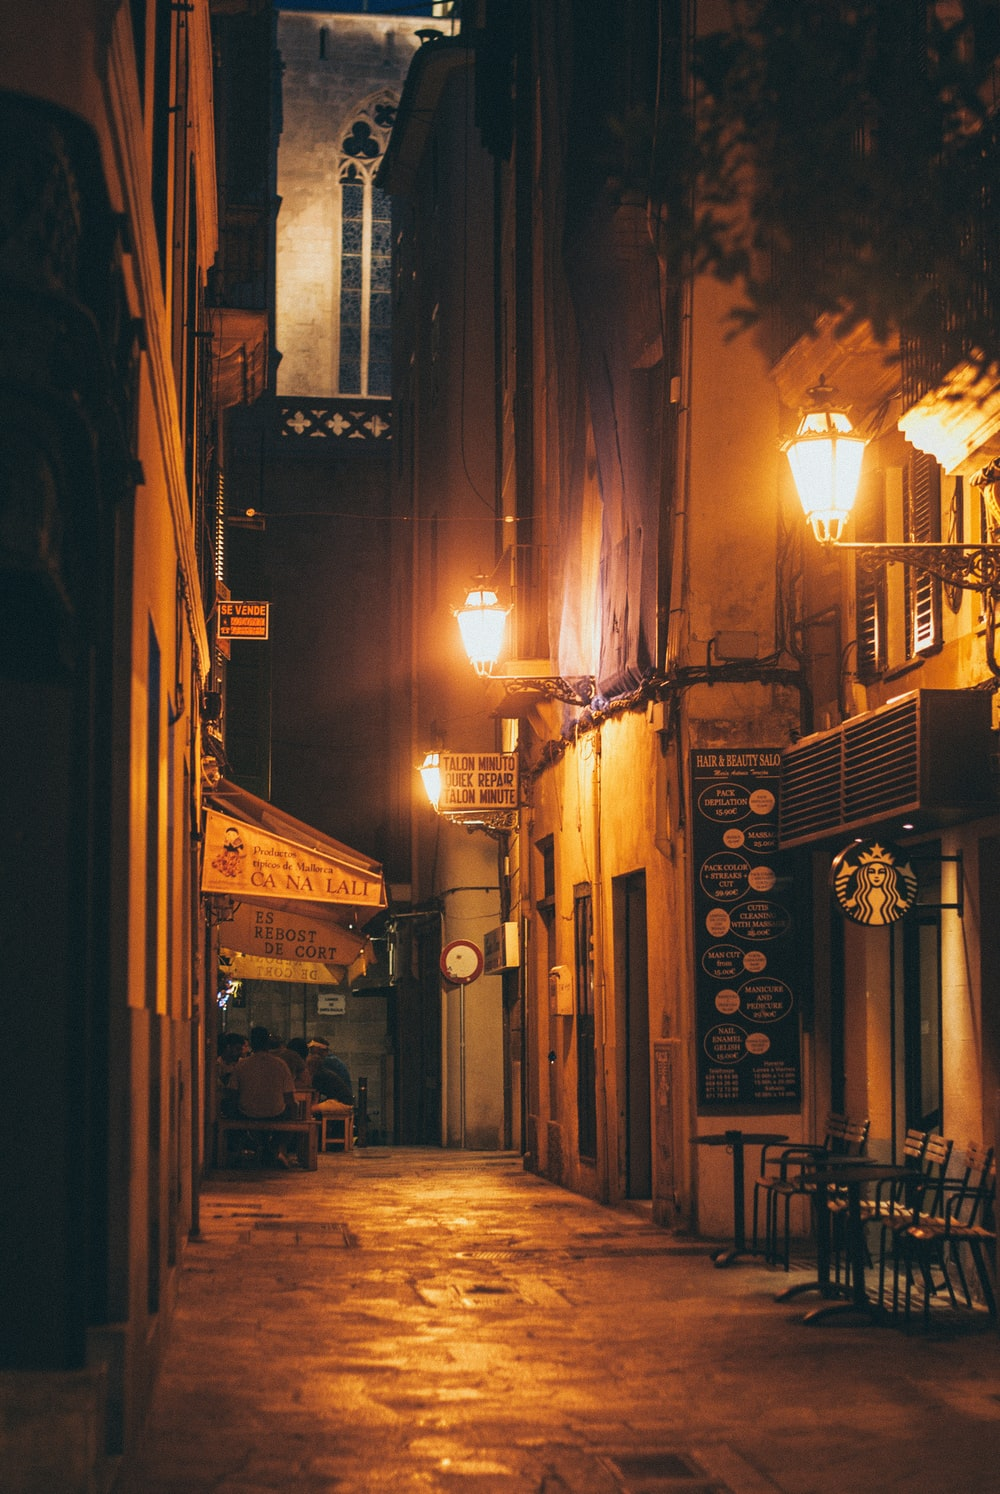 concrete hallway during nighttime